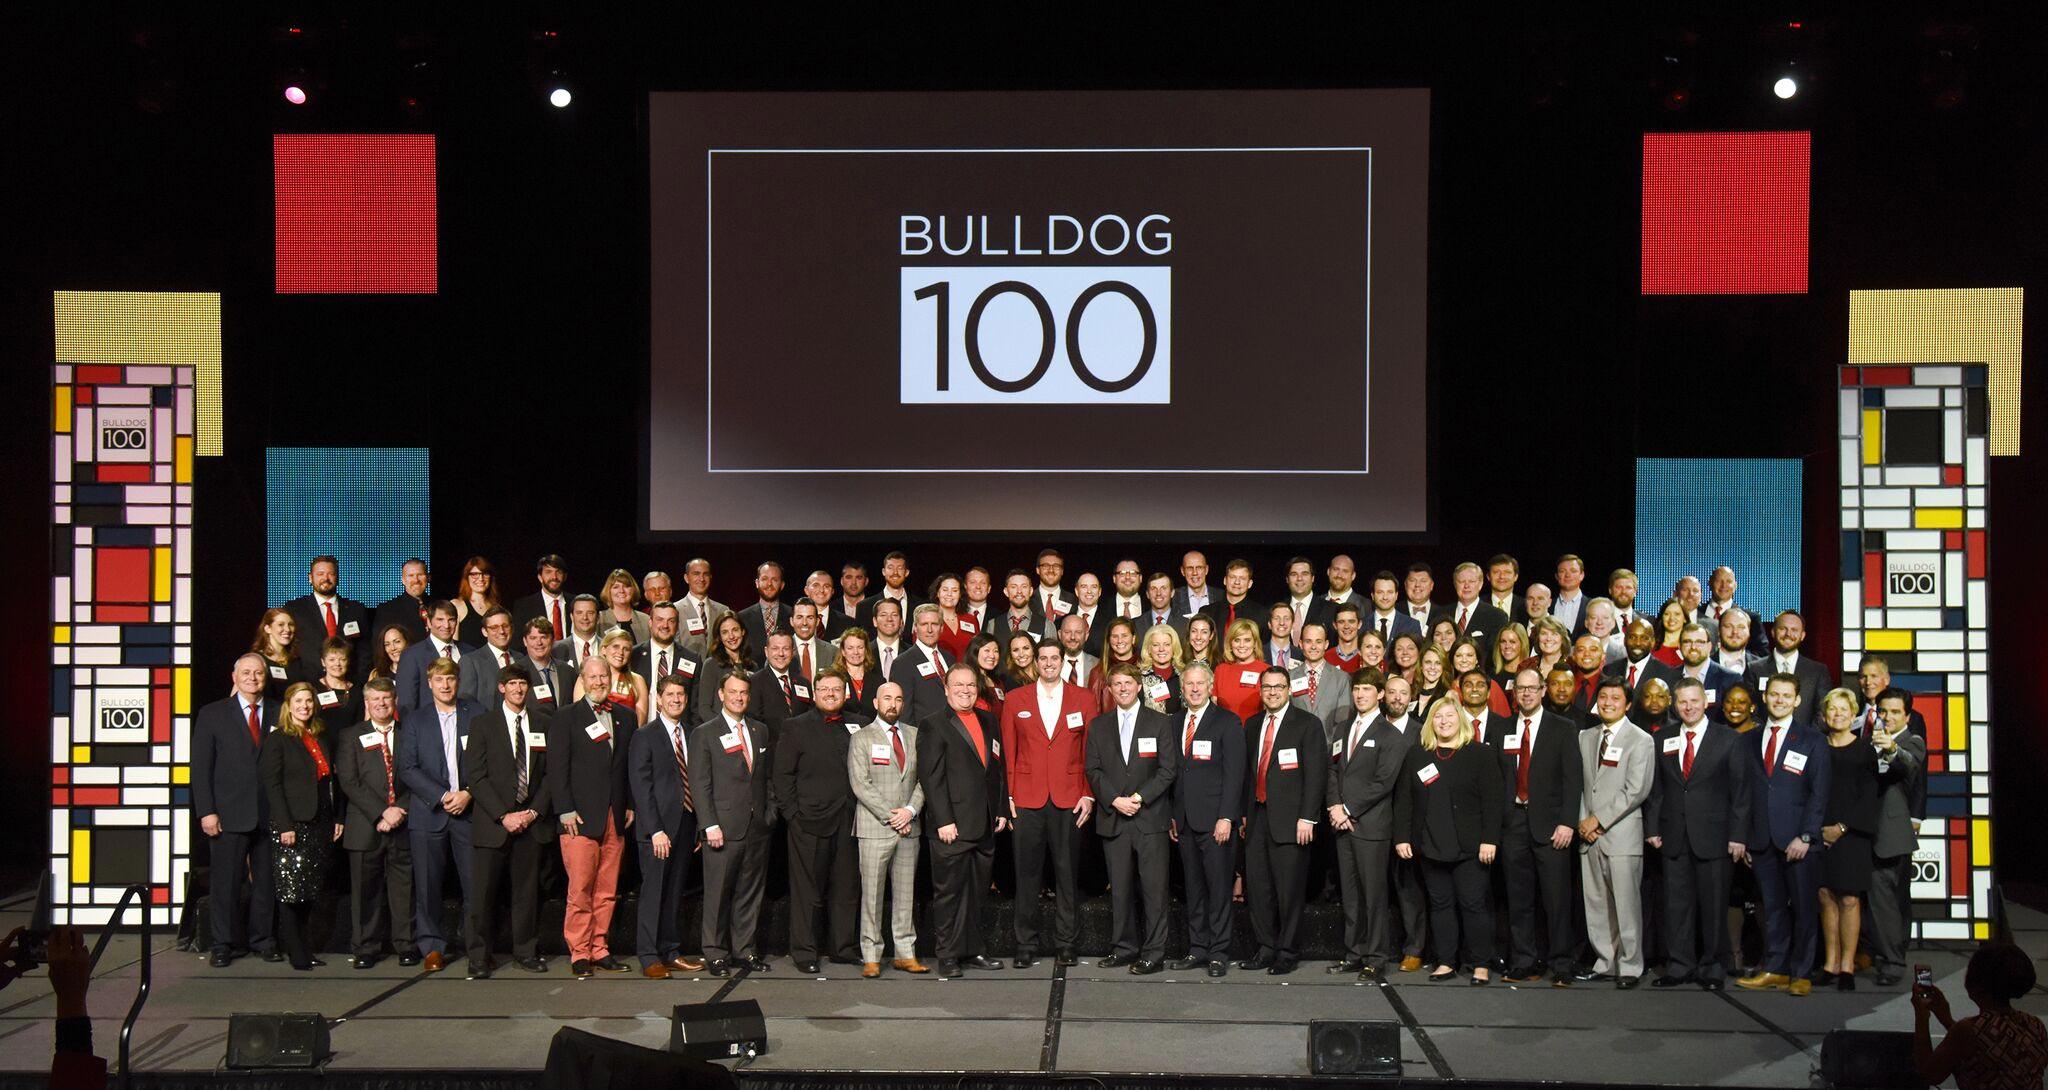 Bulldog 100 2018